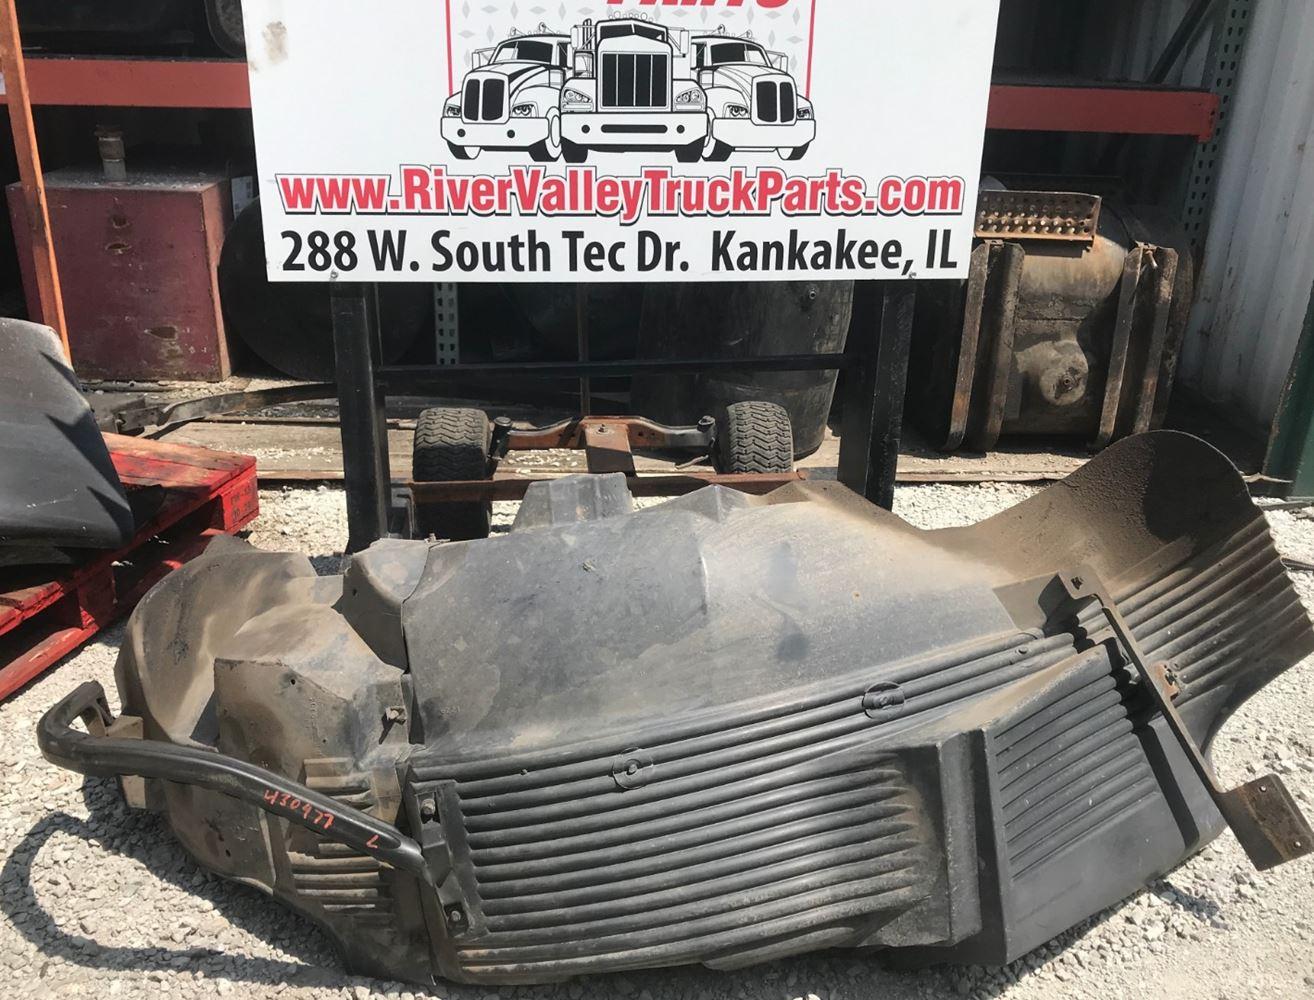 Hoods, Fenders & Grilles | River Valley Truck Parts